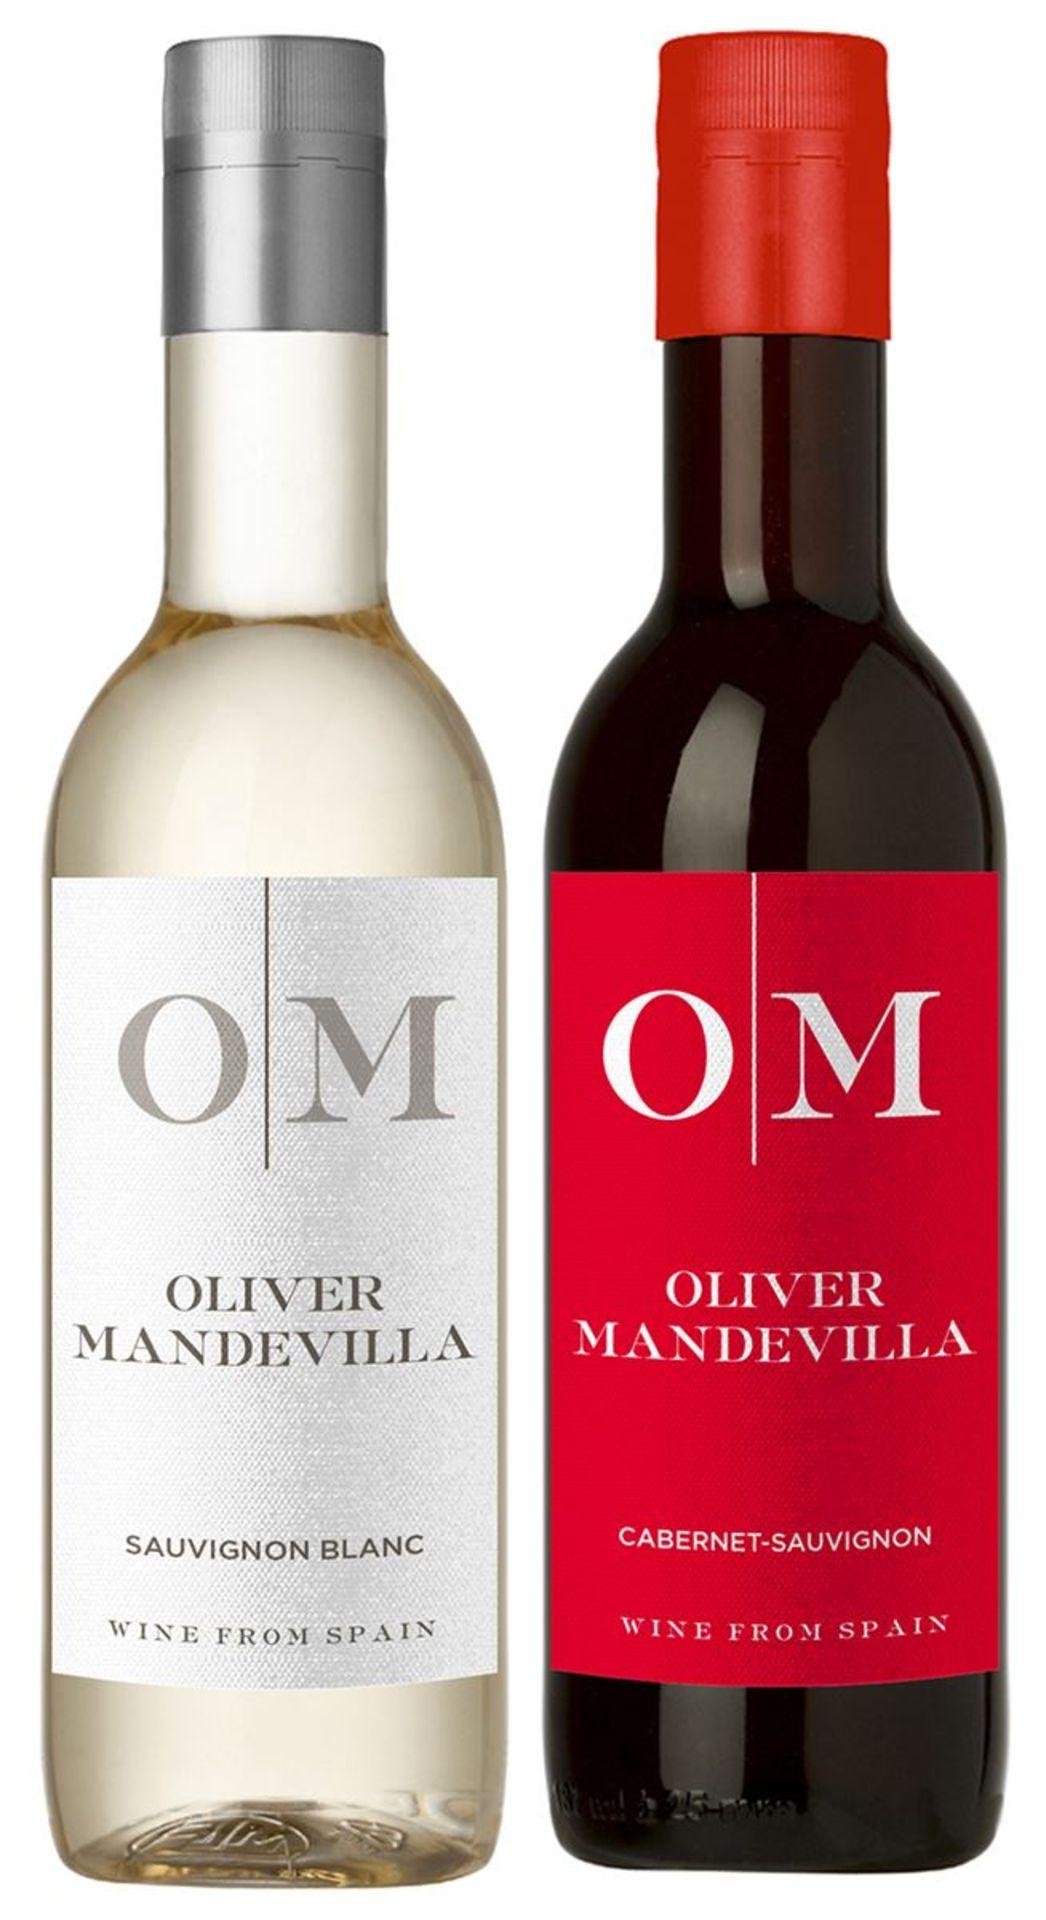 1 x Pallet of Oliver Mandevilla Cabernet-Sauvignon - Image 2 of 4